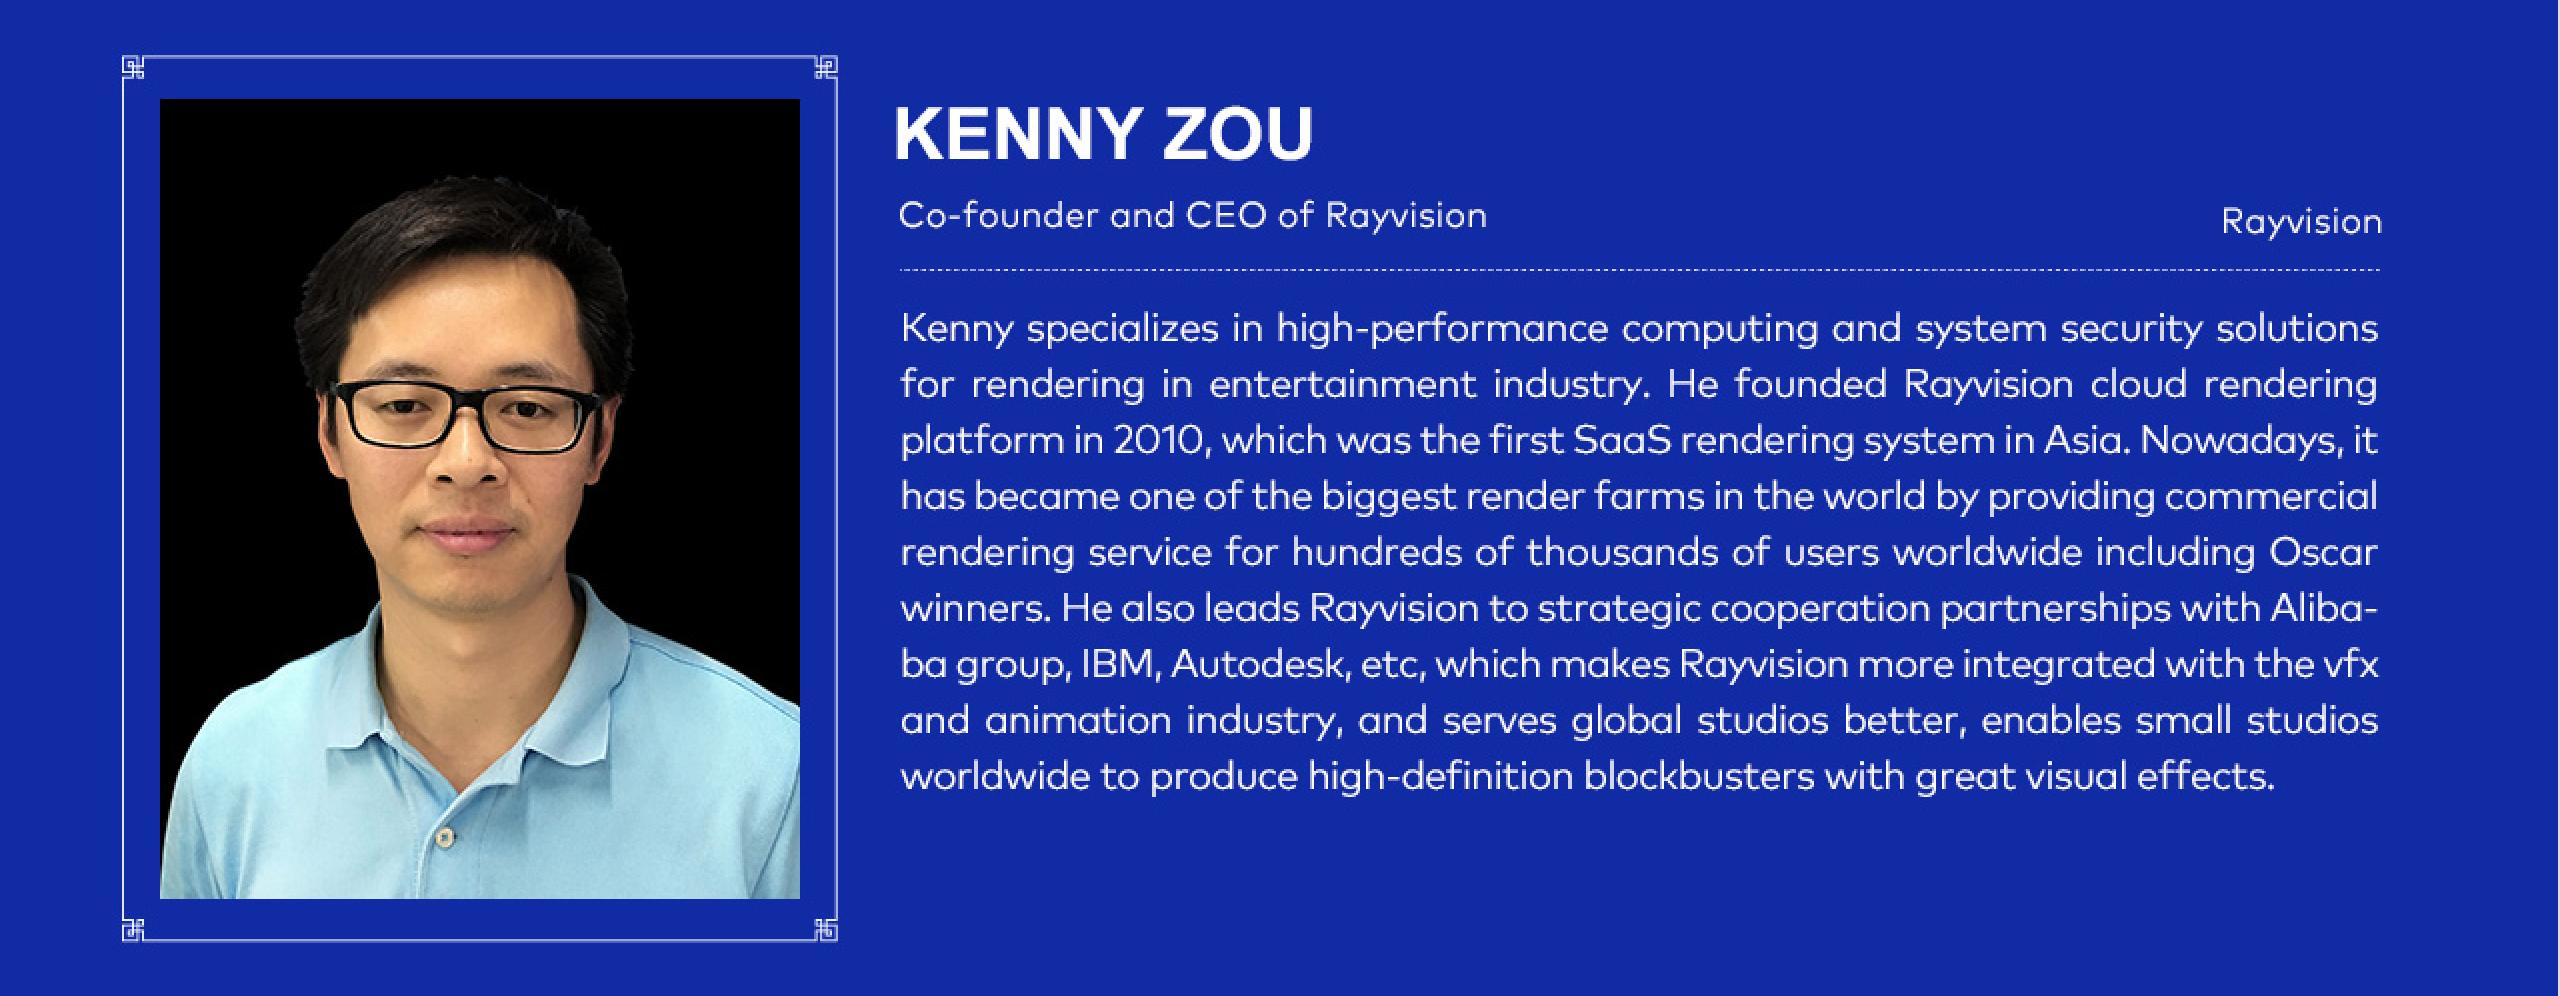 Kenny Zou - Rayvision CEO